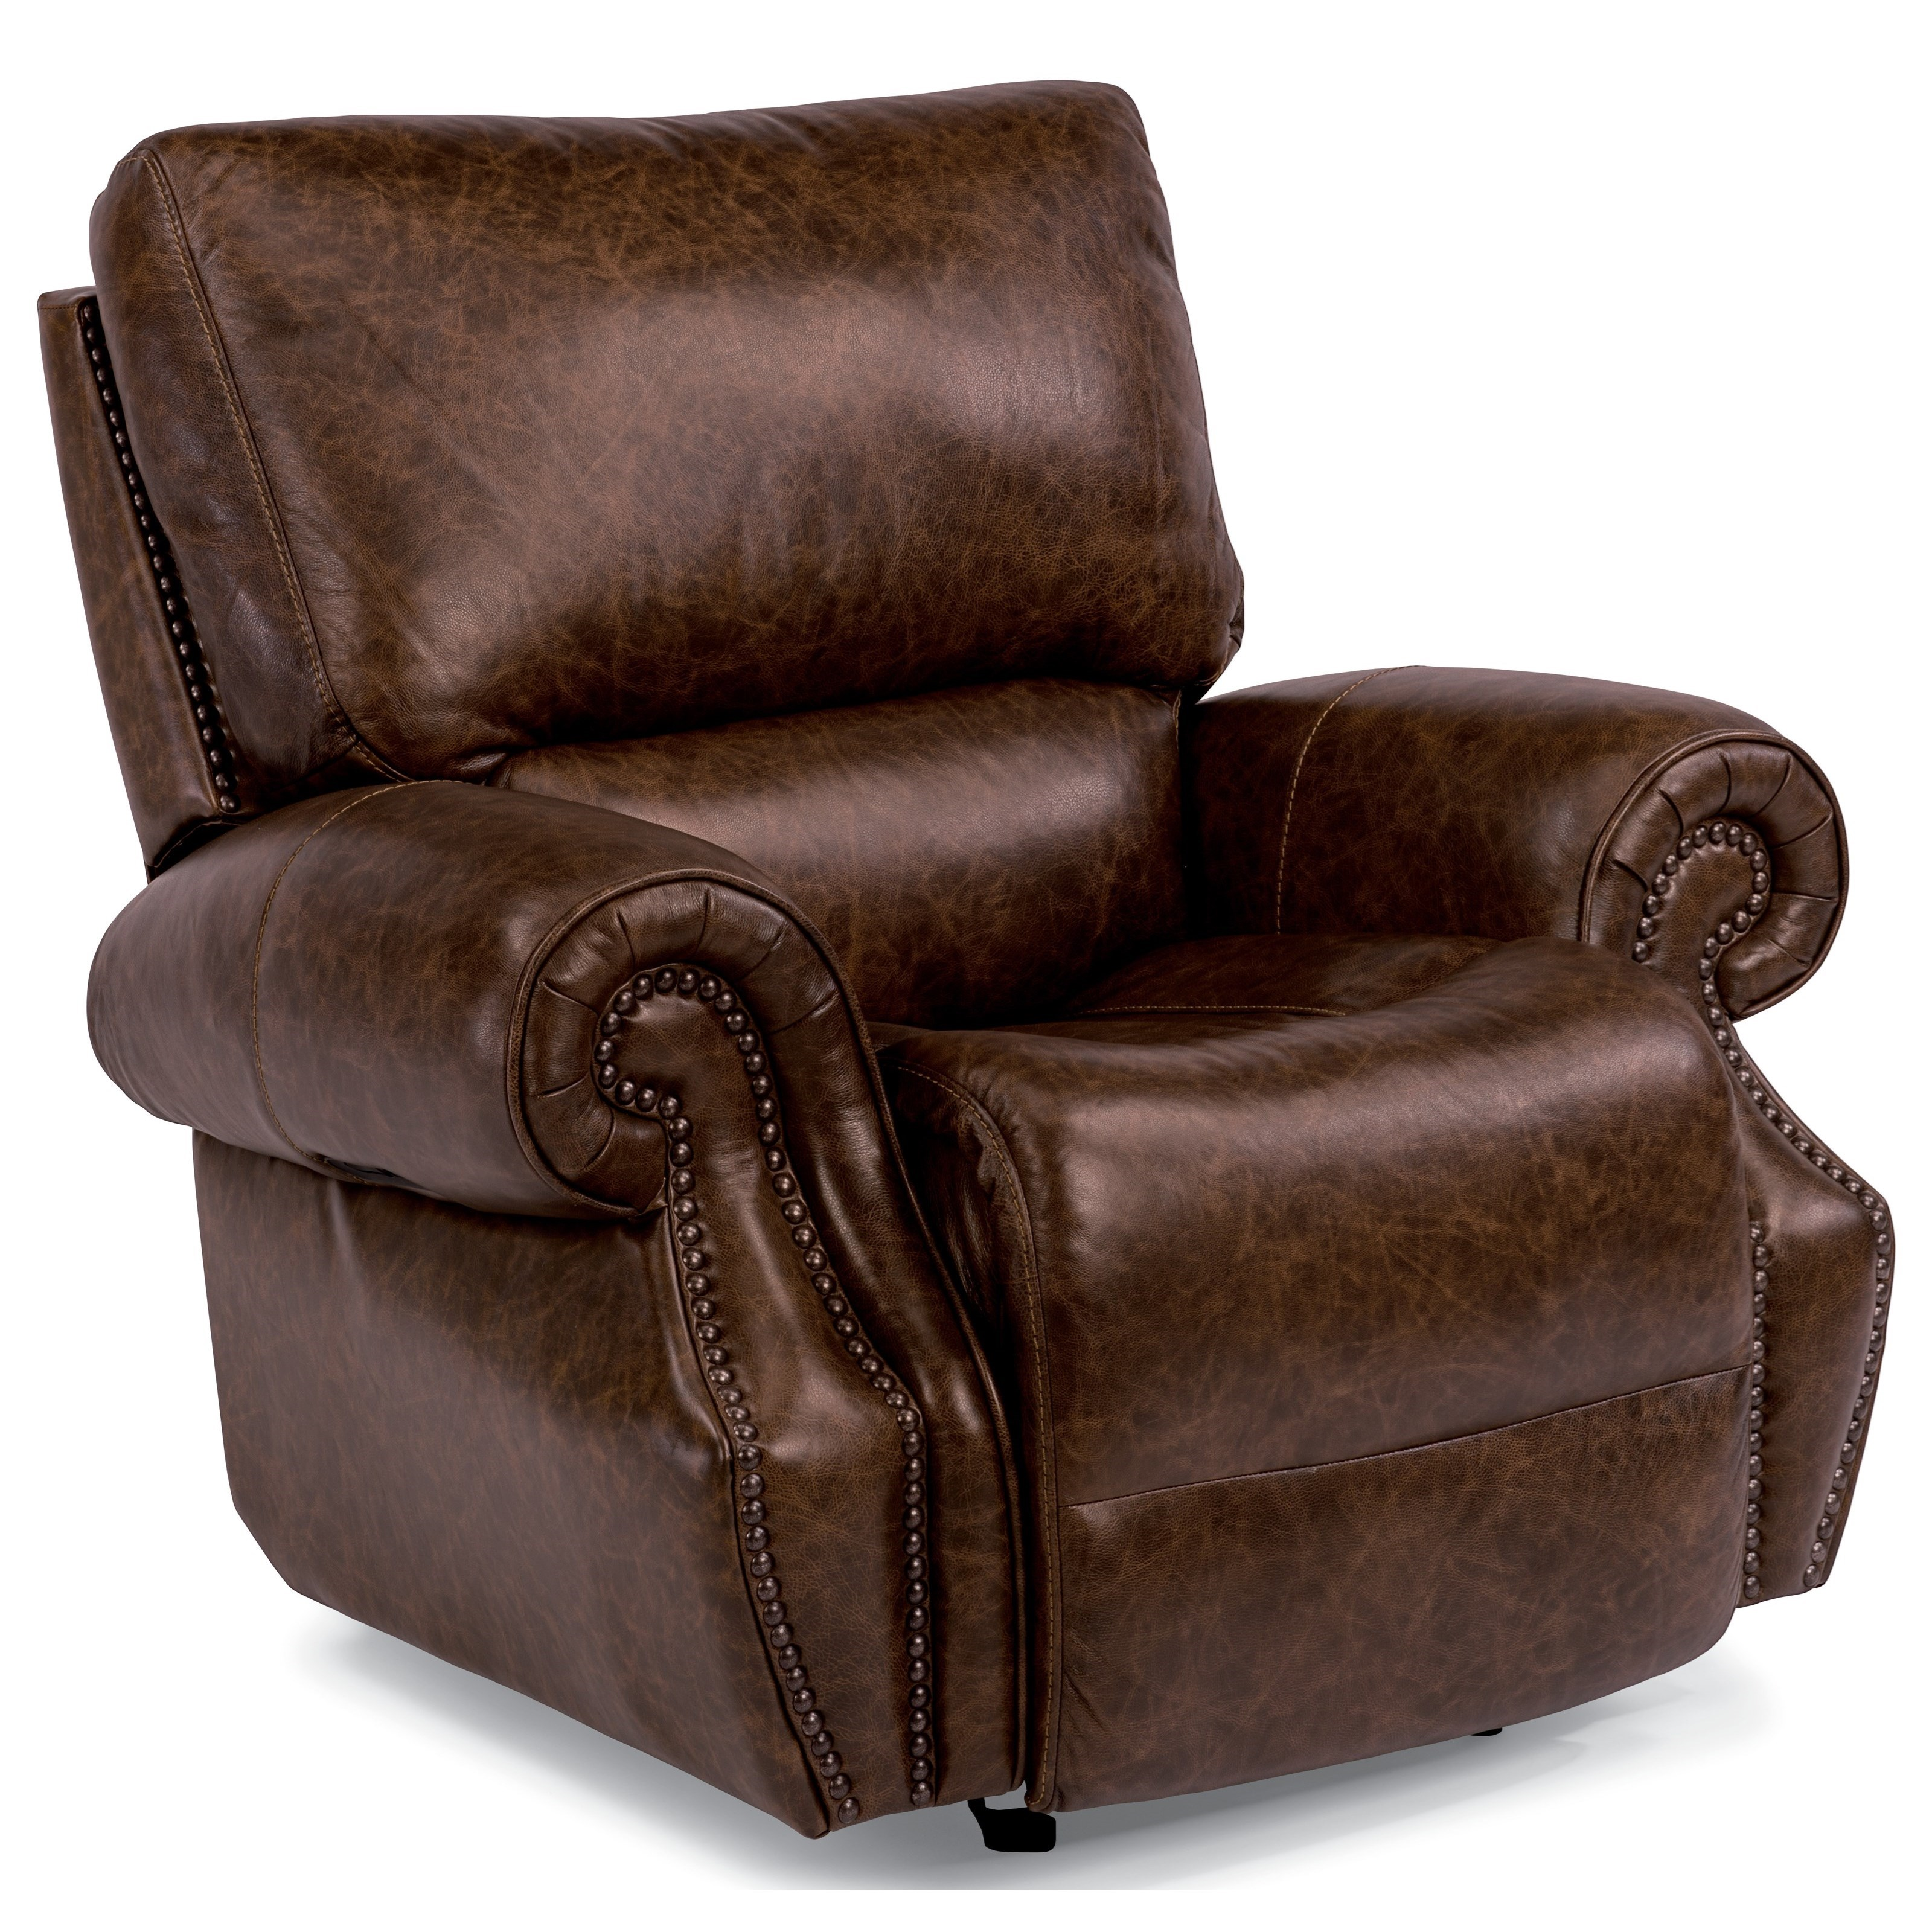 Flexsteel Latitudes-Colton Pwr Gliding Recl w/ Pwr Headrest - Item Number: 1583-54PH